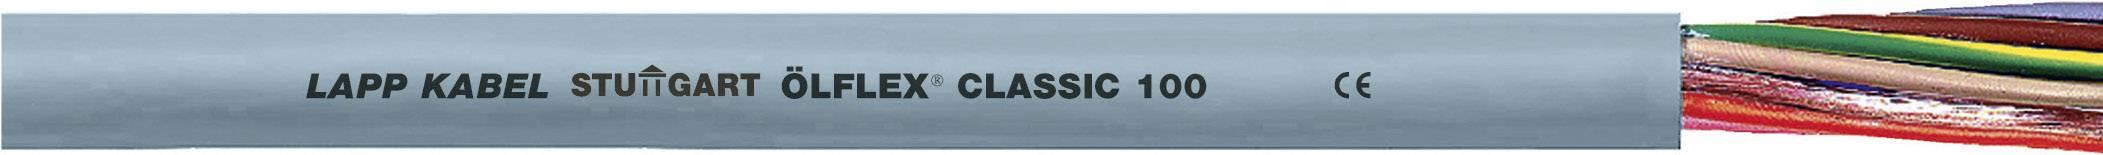 Kabel LappKabel Ölflex CLASSIC 100 5X1 (00102054), PVC, 7,1 mm, 500 V, šedá, 1000 m